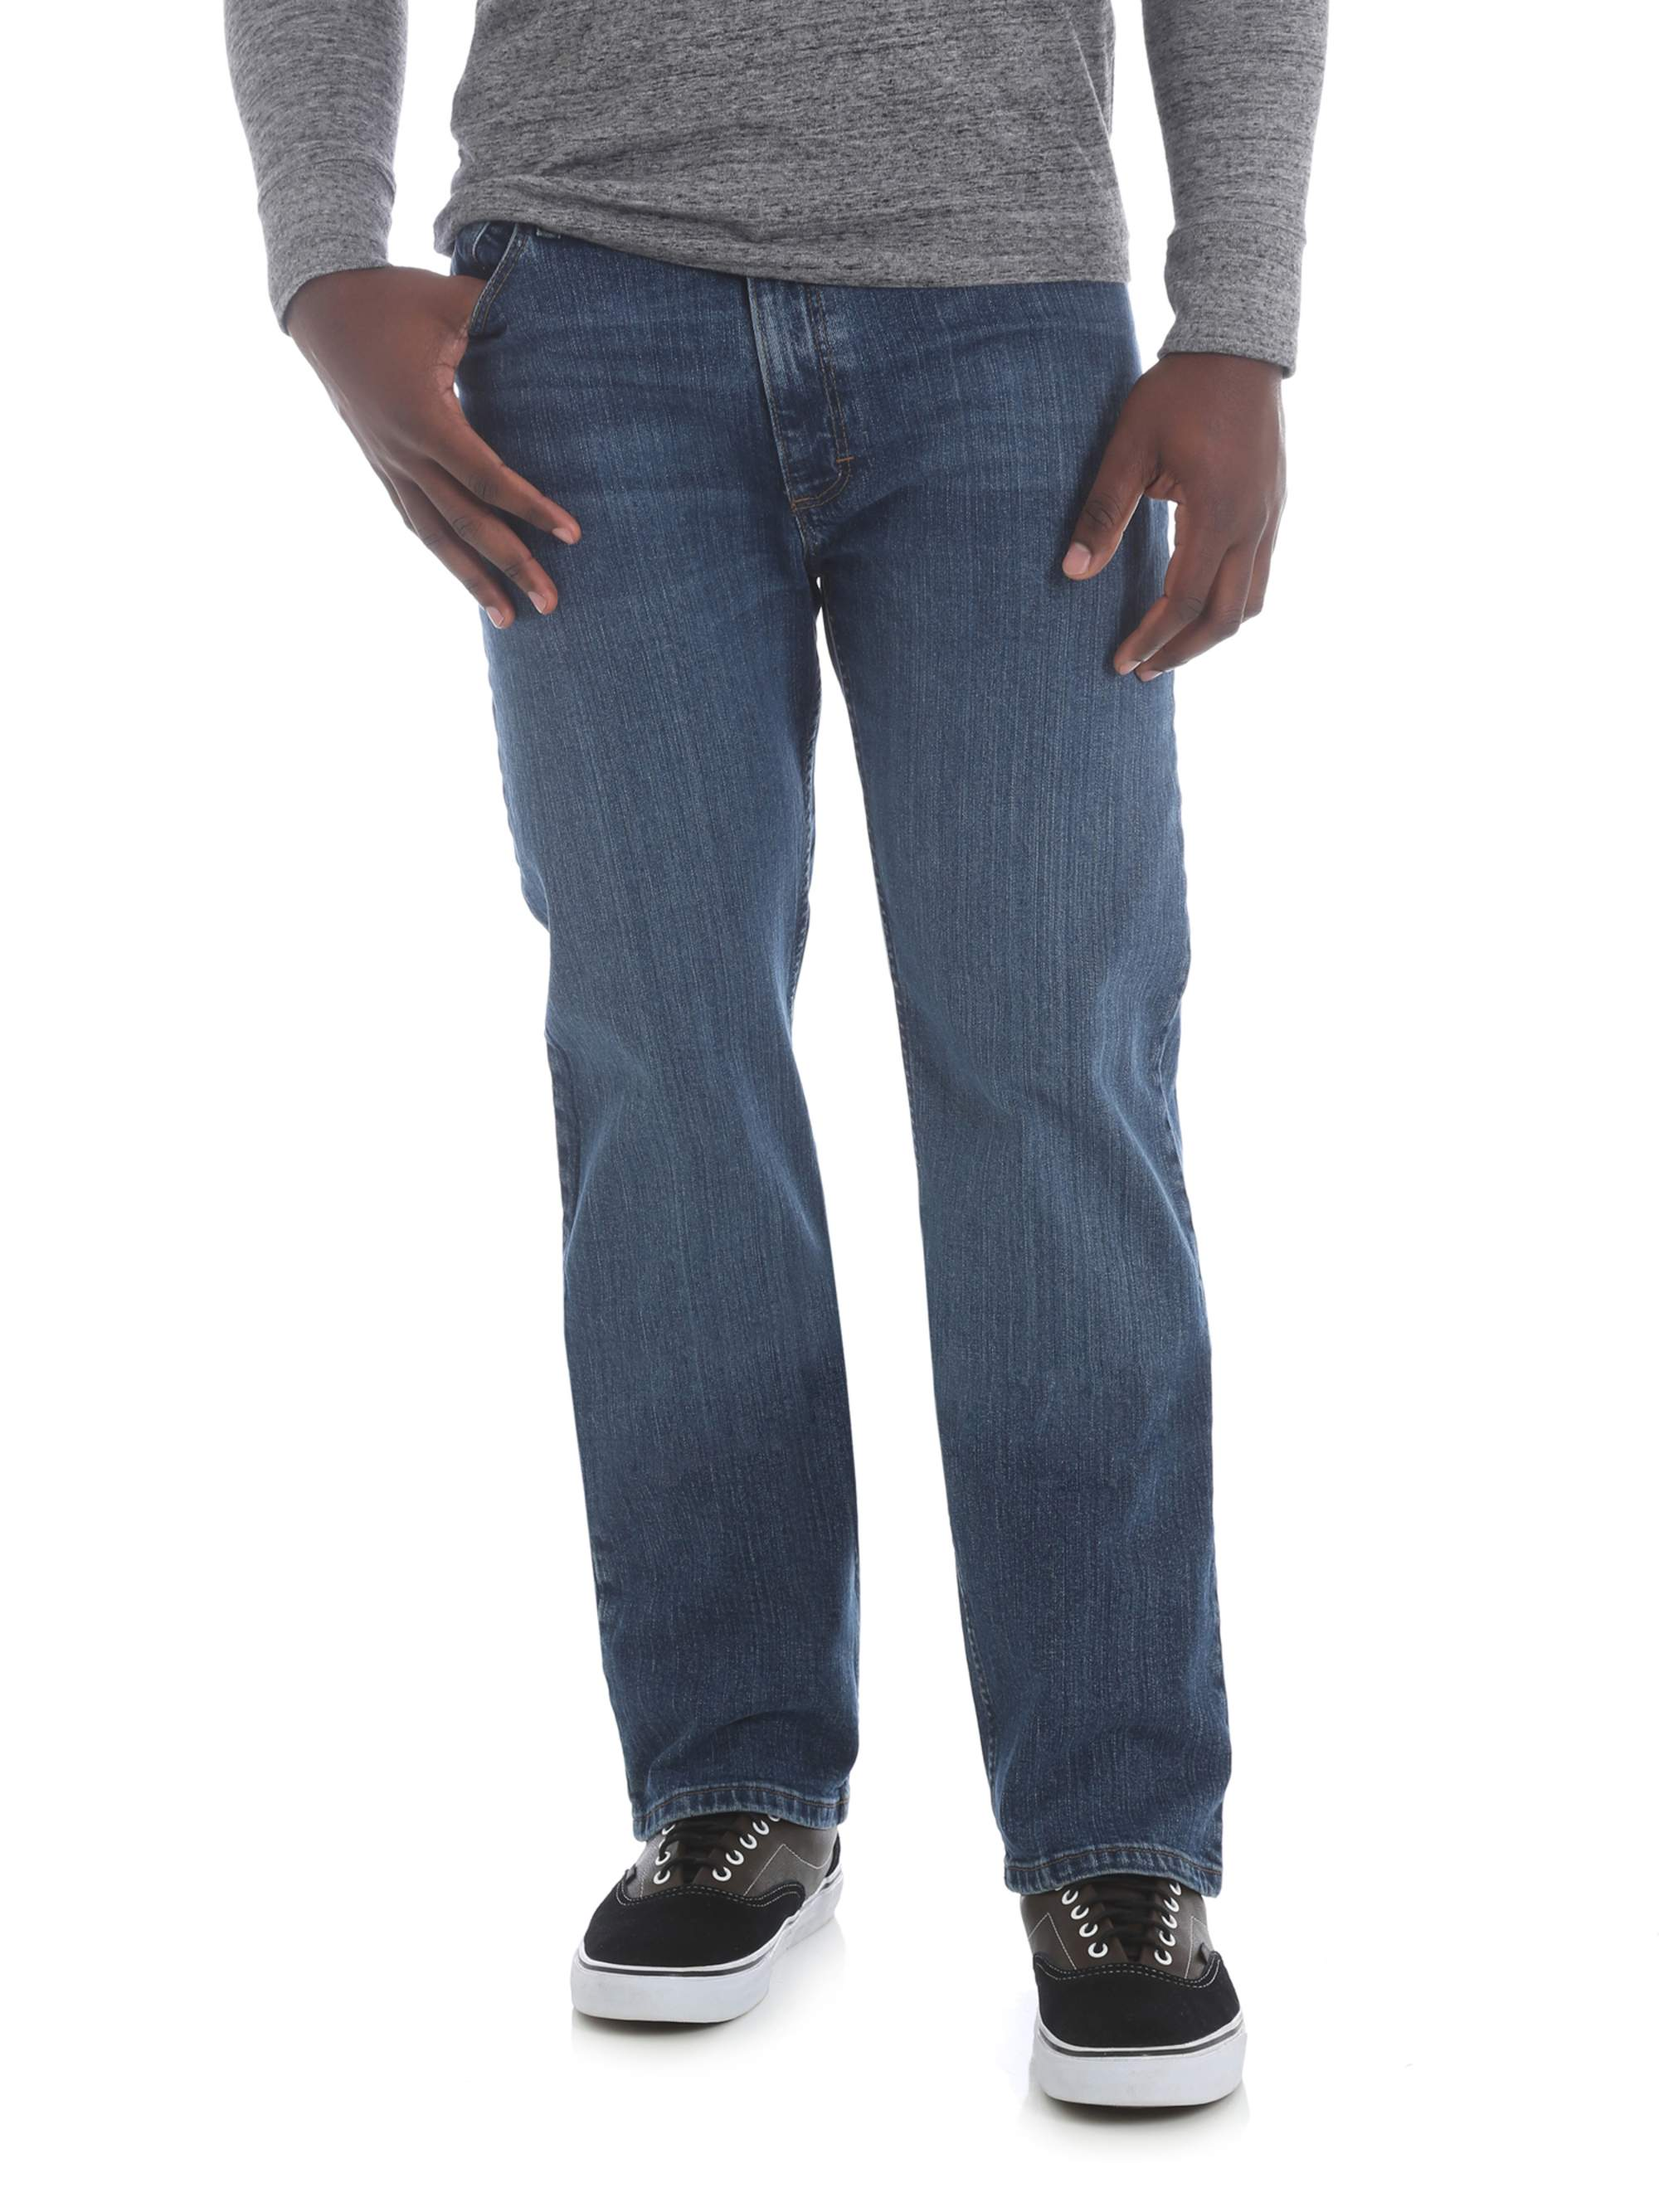 a5972882ca7ccf Wrangler - Wrangler Men's 5 Star Regular Fit Jean with Flex - Walmart.com